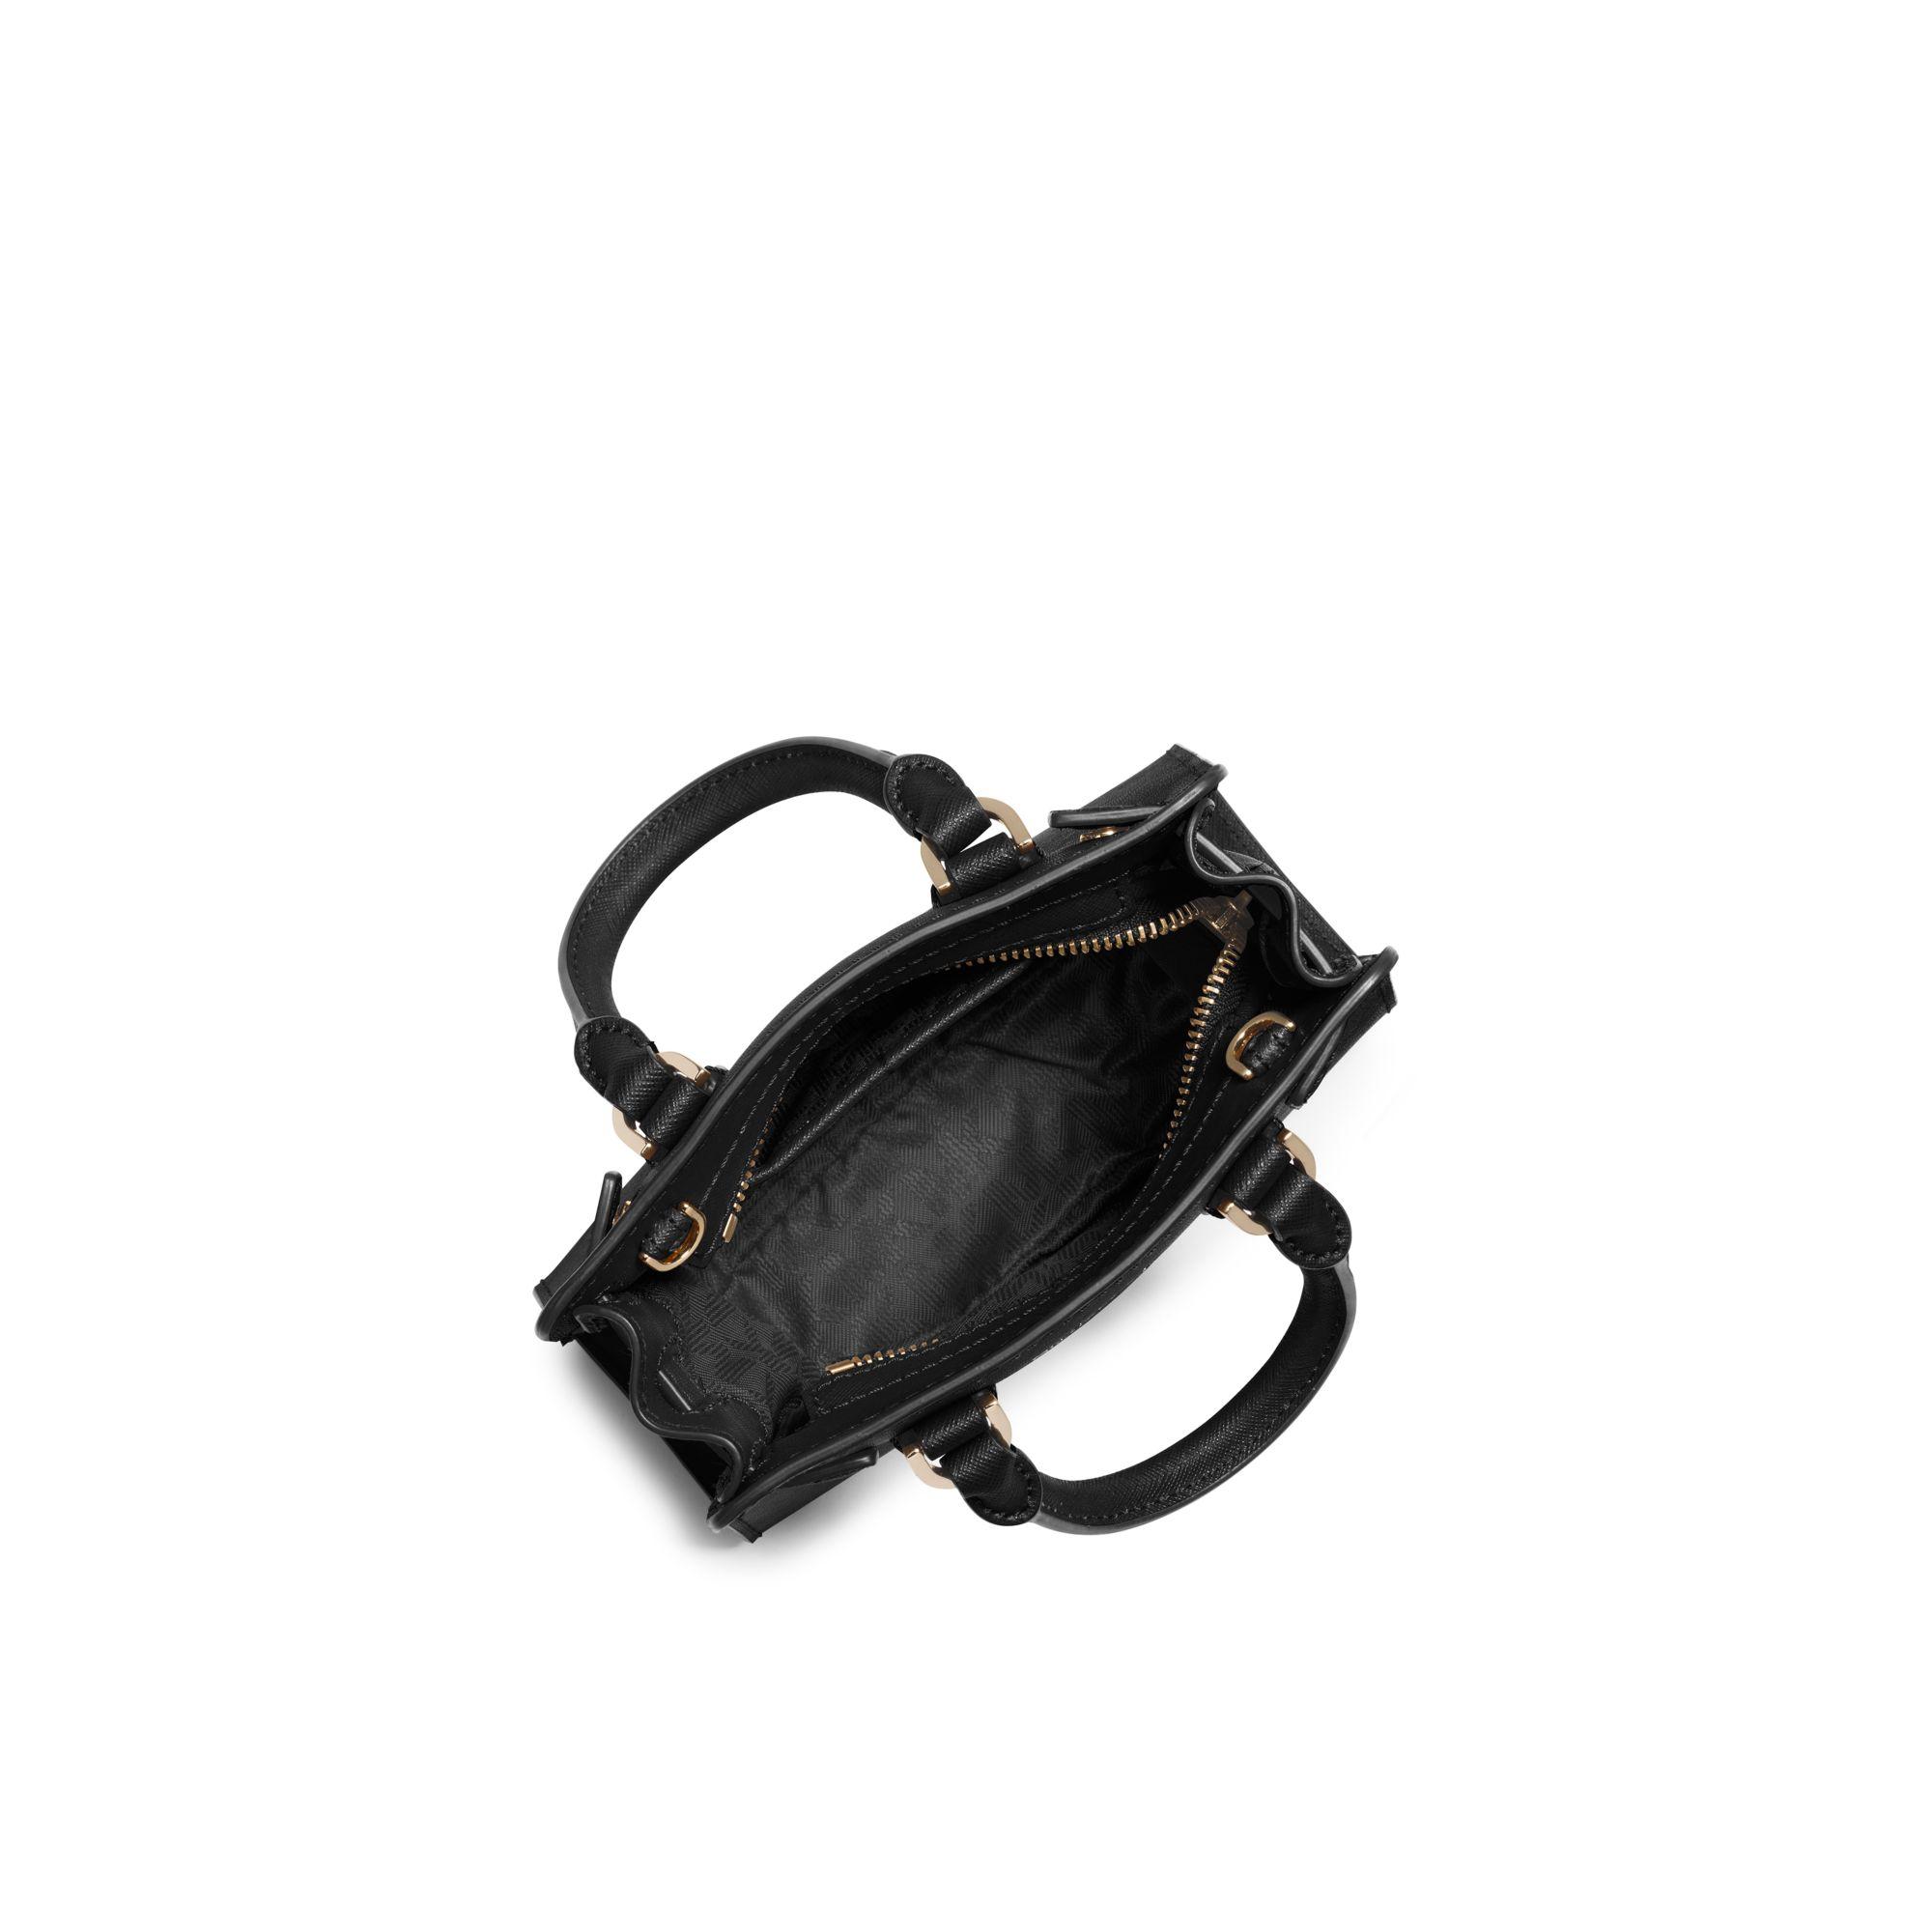 6bcb144e2de5 Lyst - Michael Kors Dillon Extra-Small Cross-Body Bag in Black